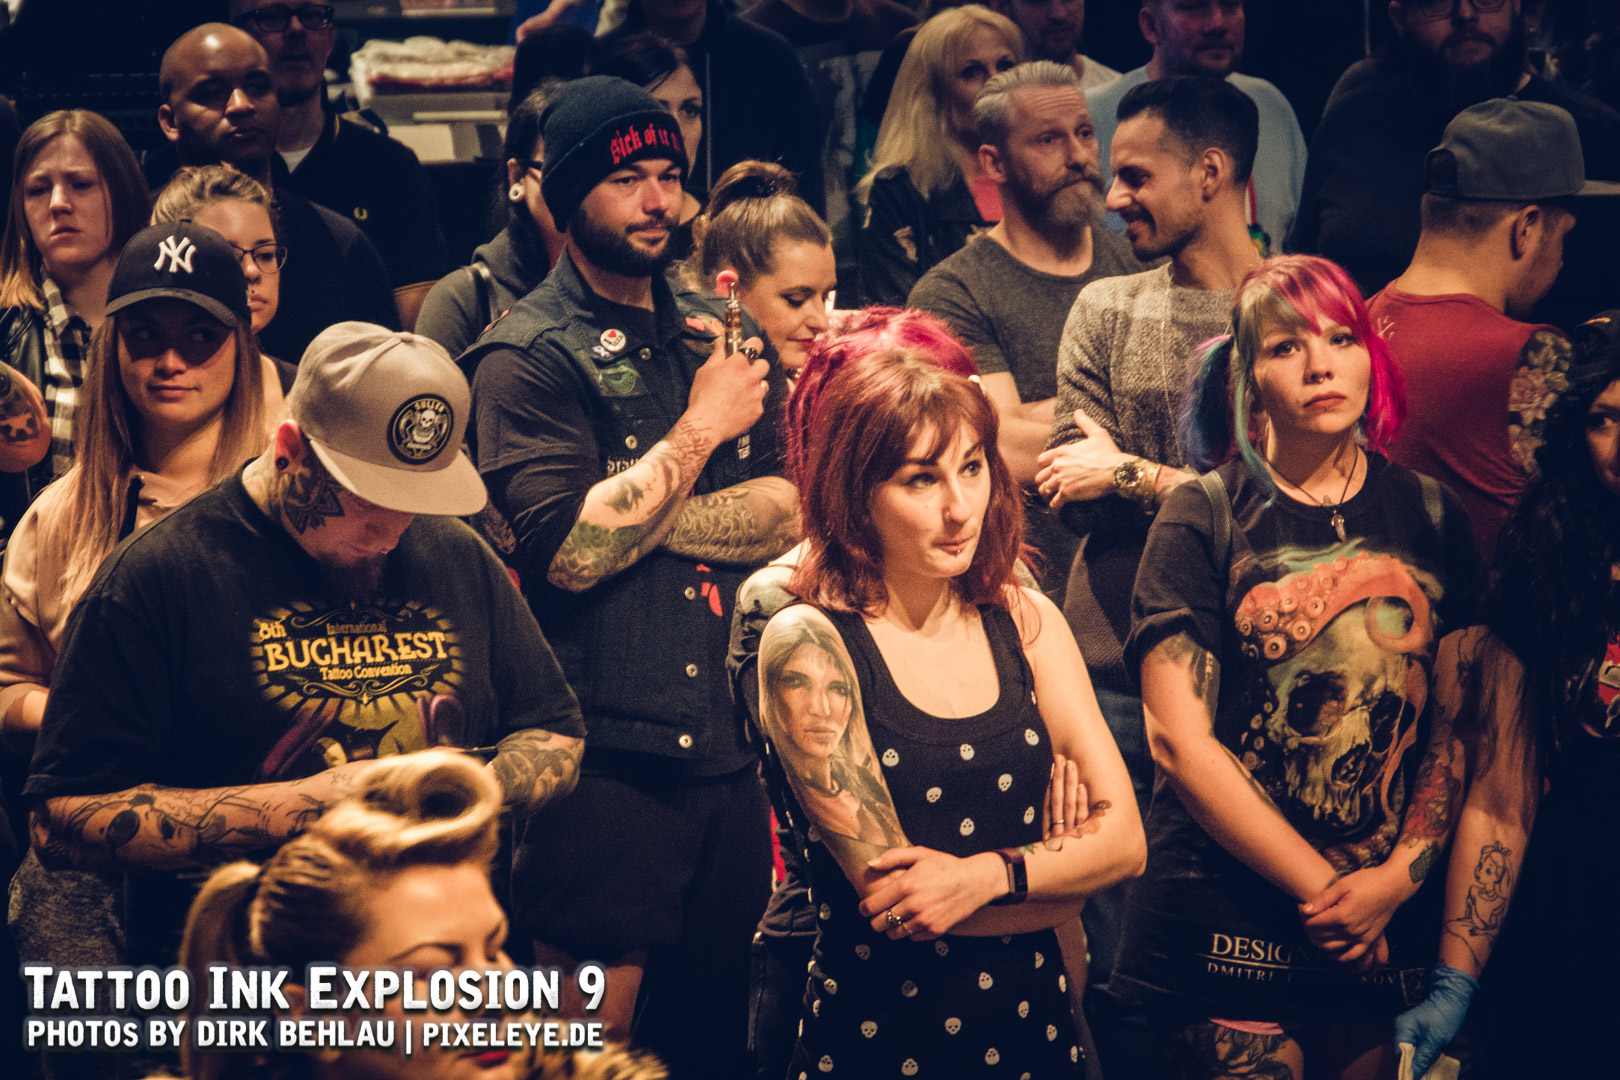 Tattoo Ink Explosion 2018 WEB by Dirk Behlau-1455.jpg